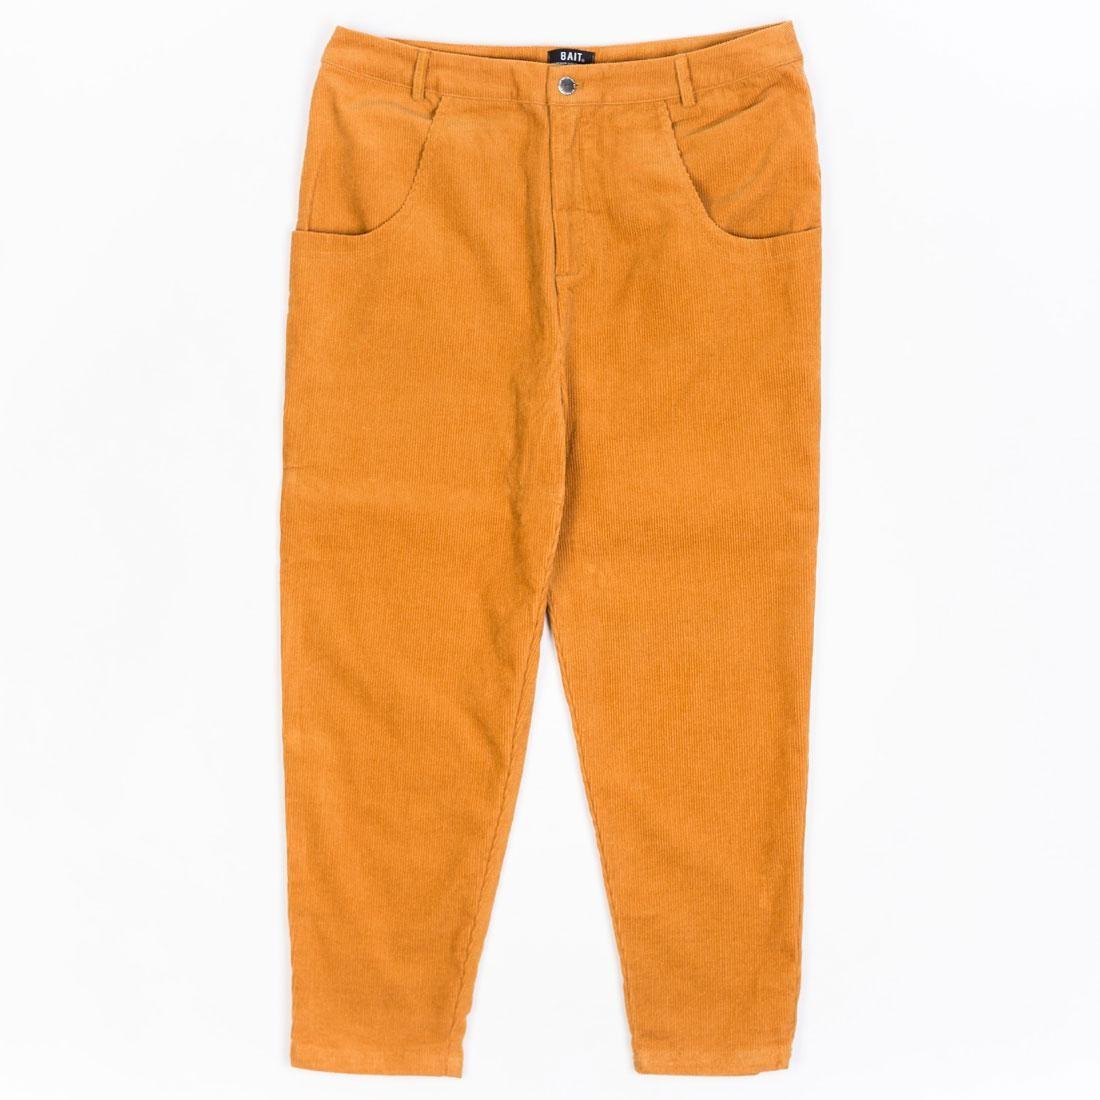 BAIT Unisex Corduroy Tailored Pants (brown / camel)